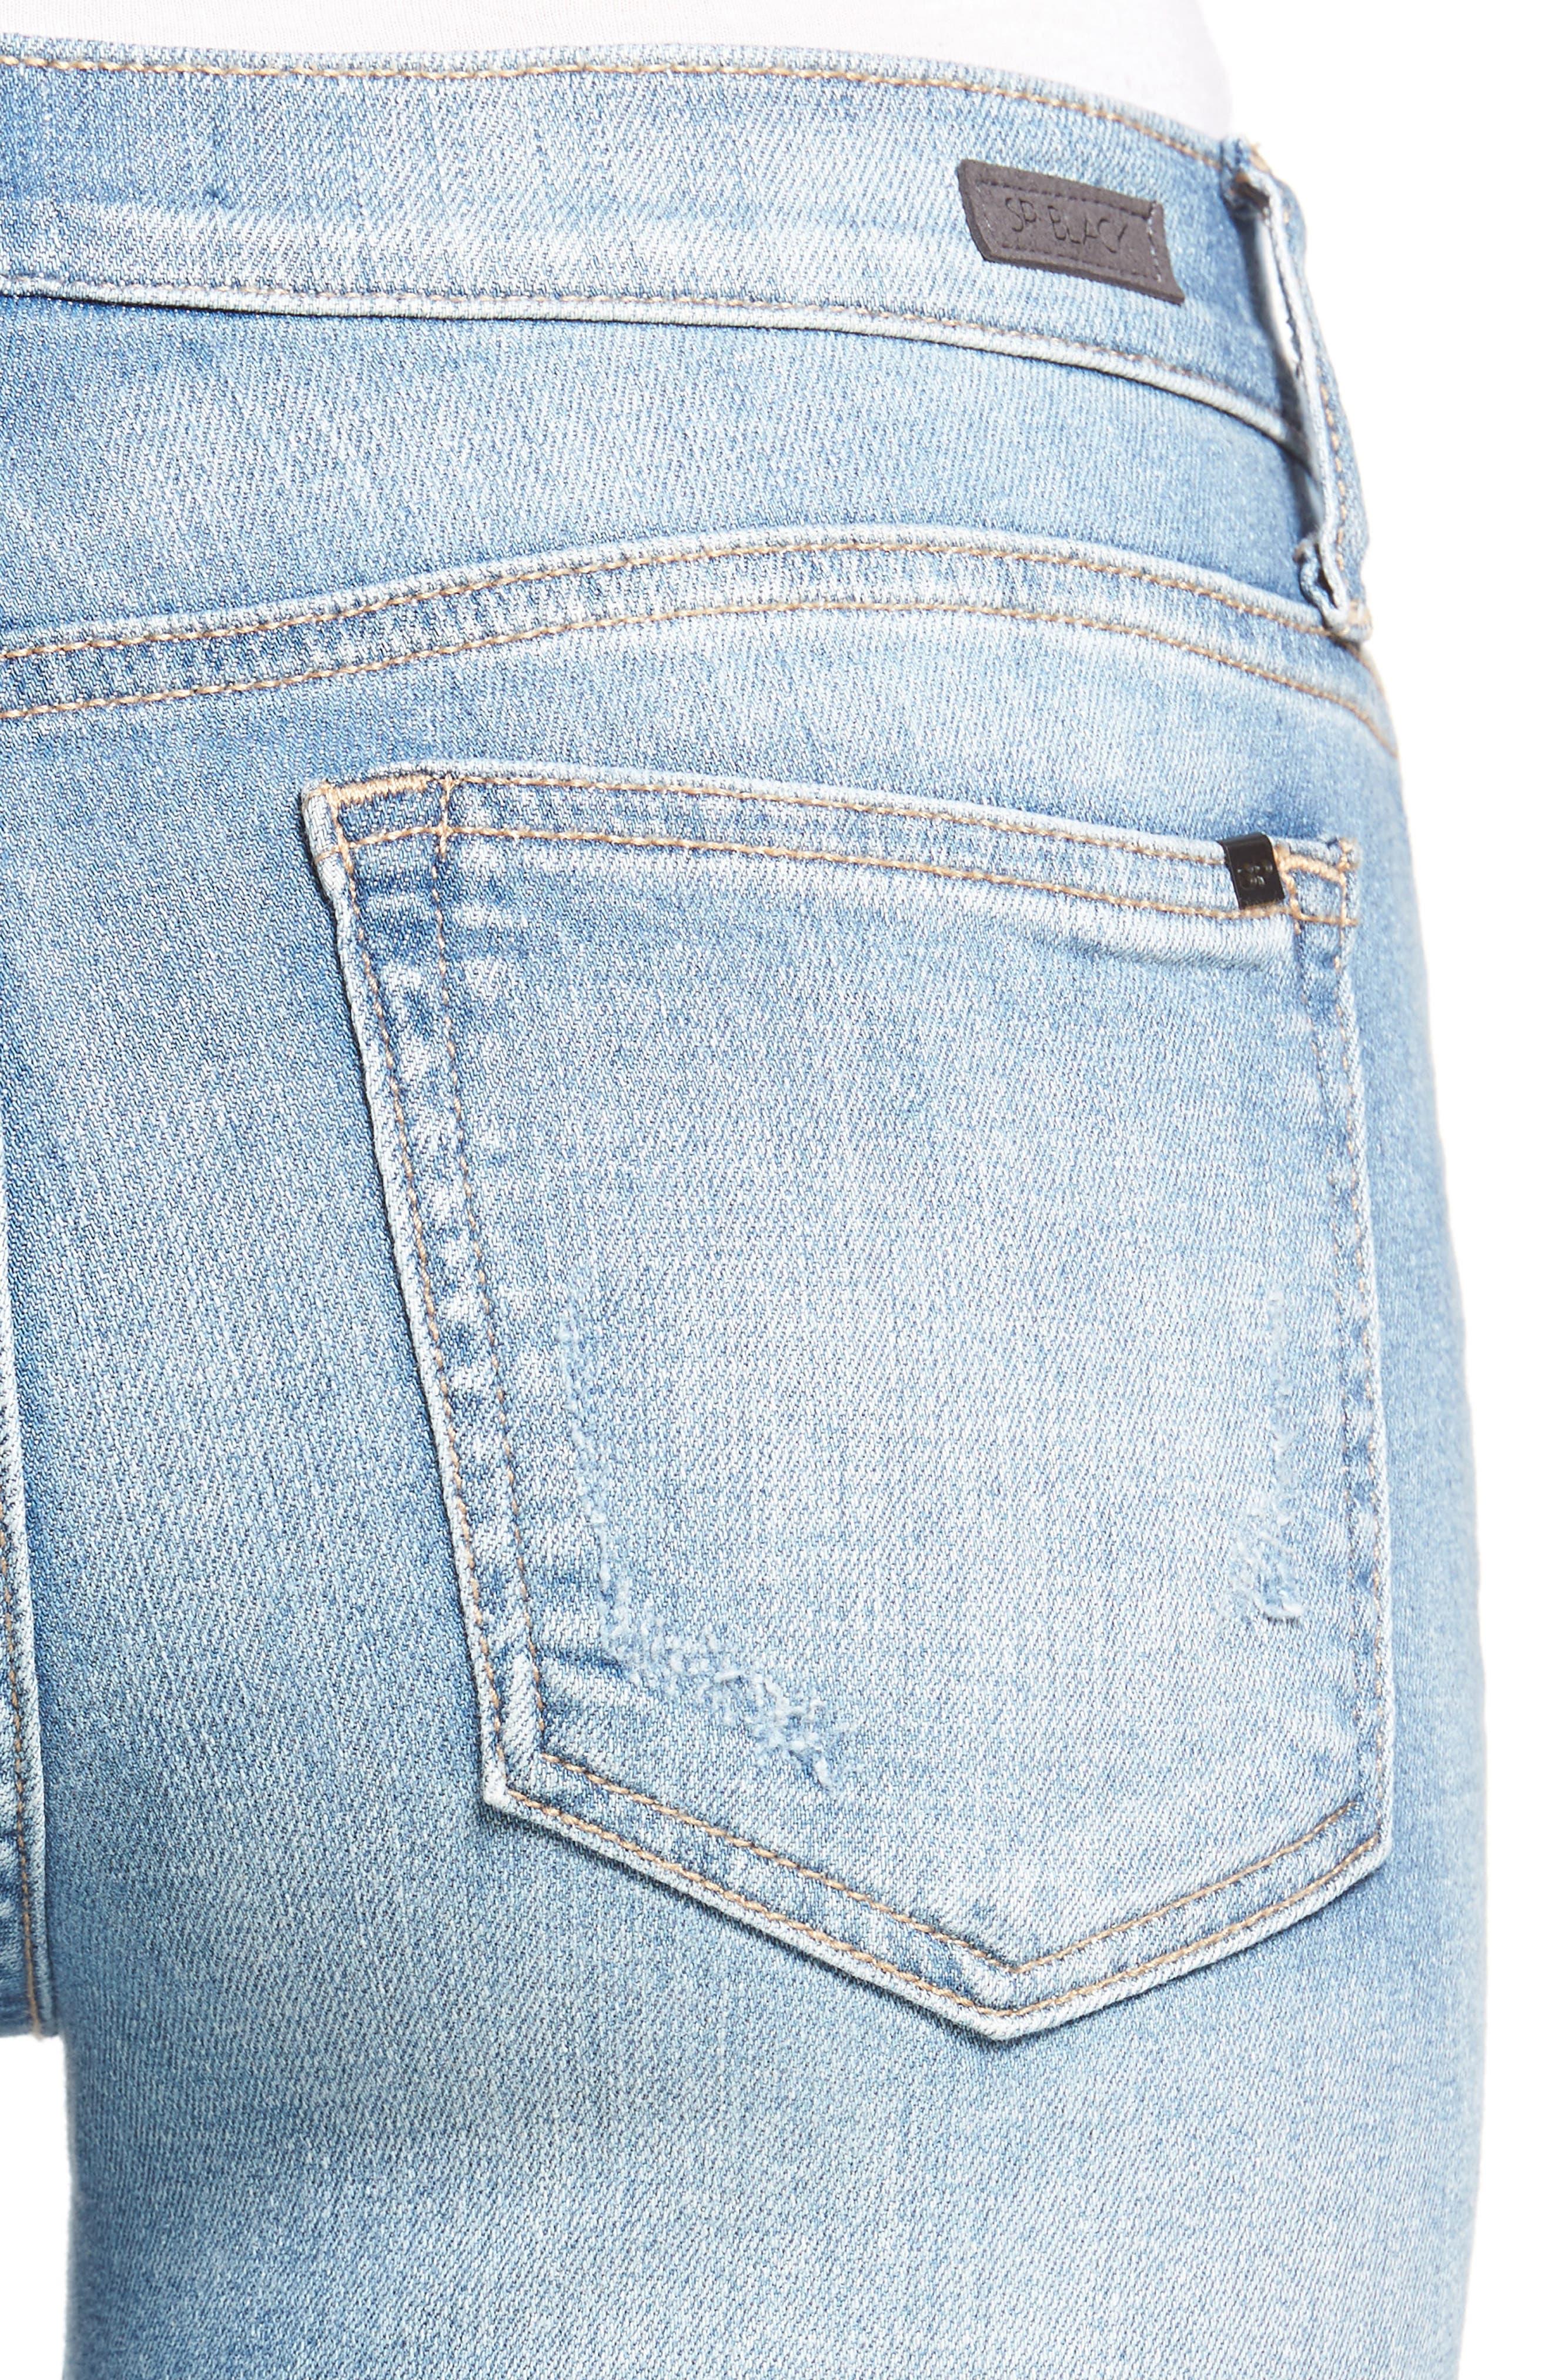 Ripped Knee Skinny Jeans,                             Alternate thumbnail 4, color,                             MEDIUM LIGHT